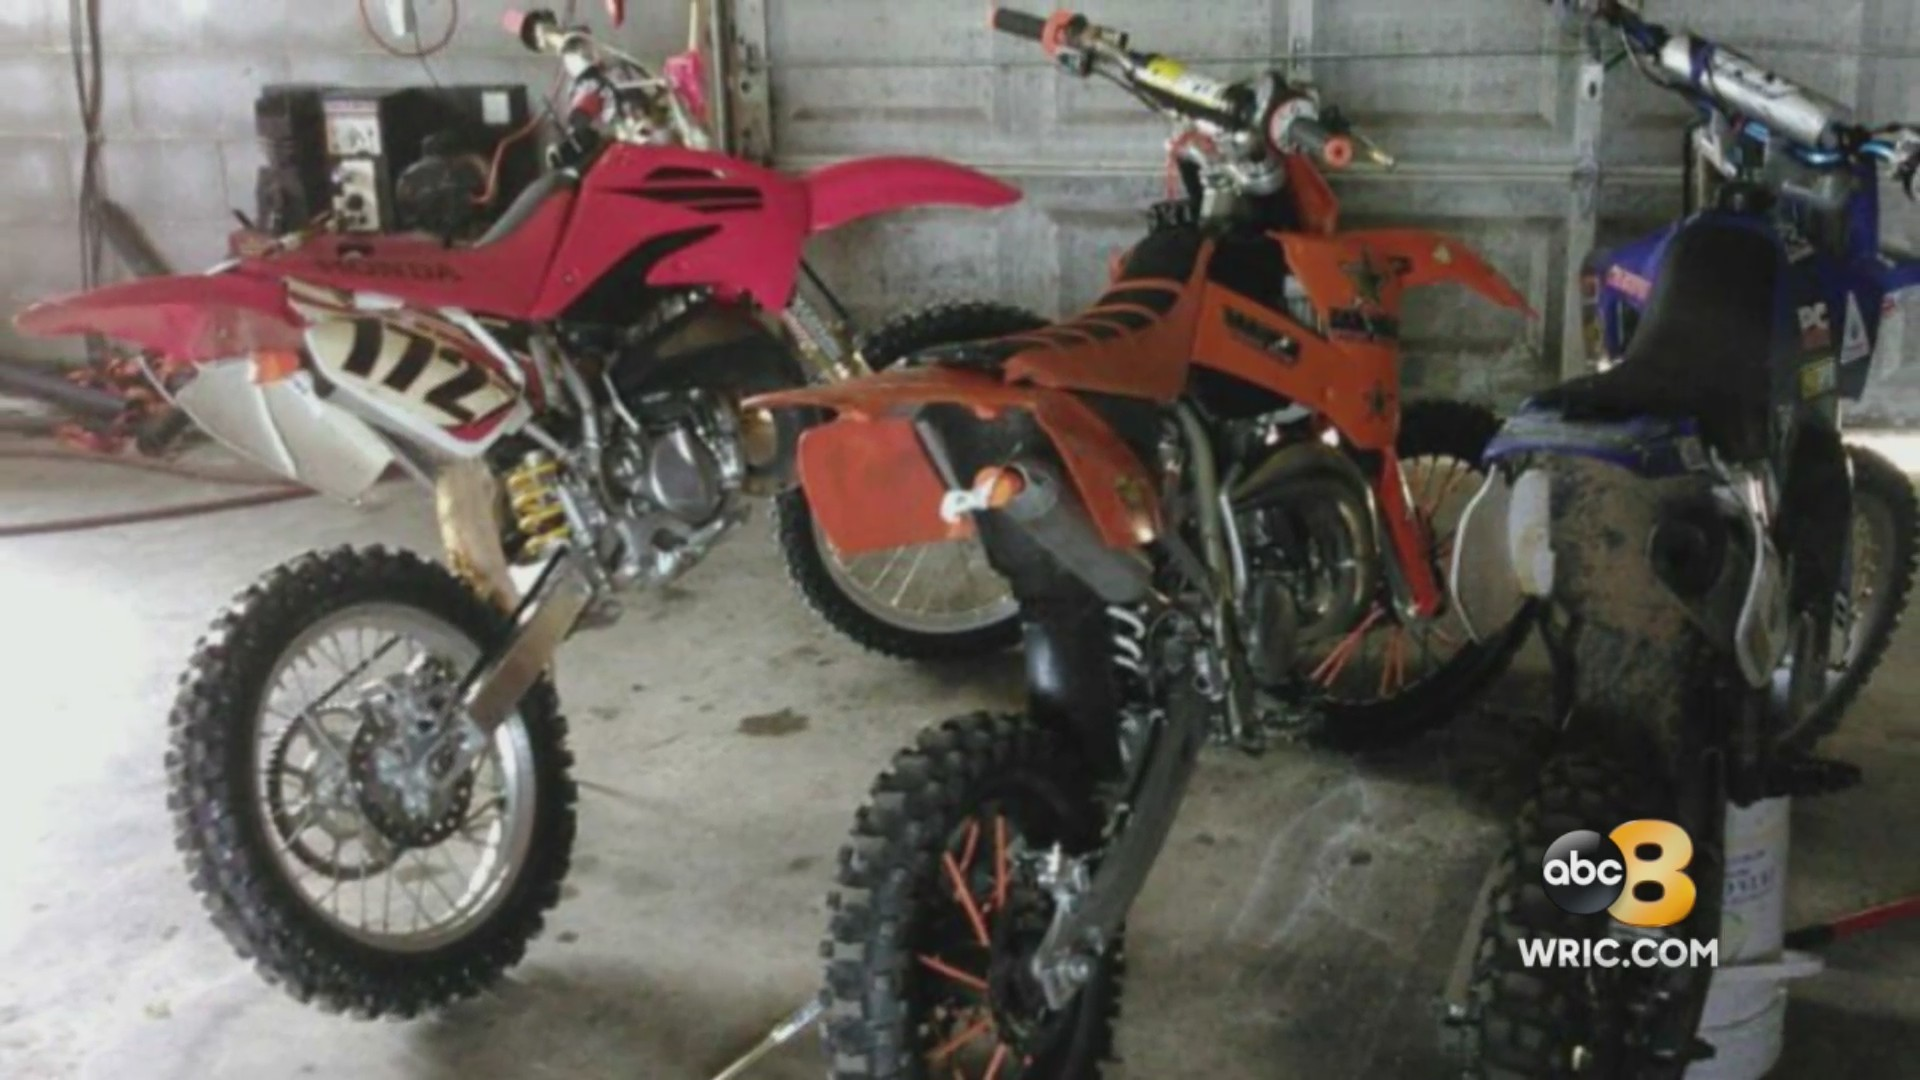 30k Worth Of Motocross Bikes Equipment Stolen From Amelia Family